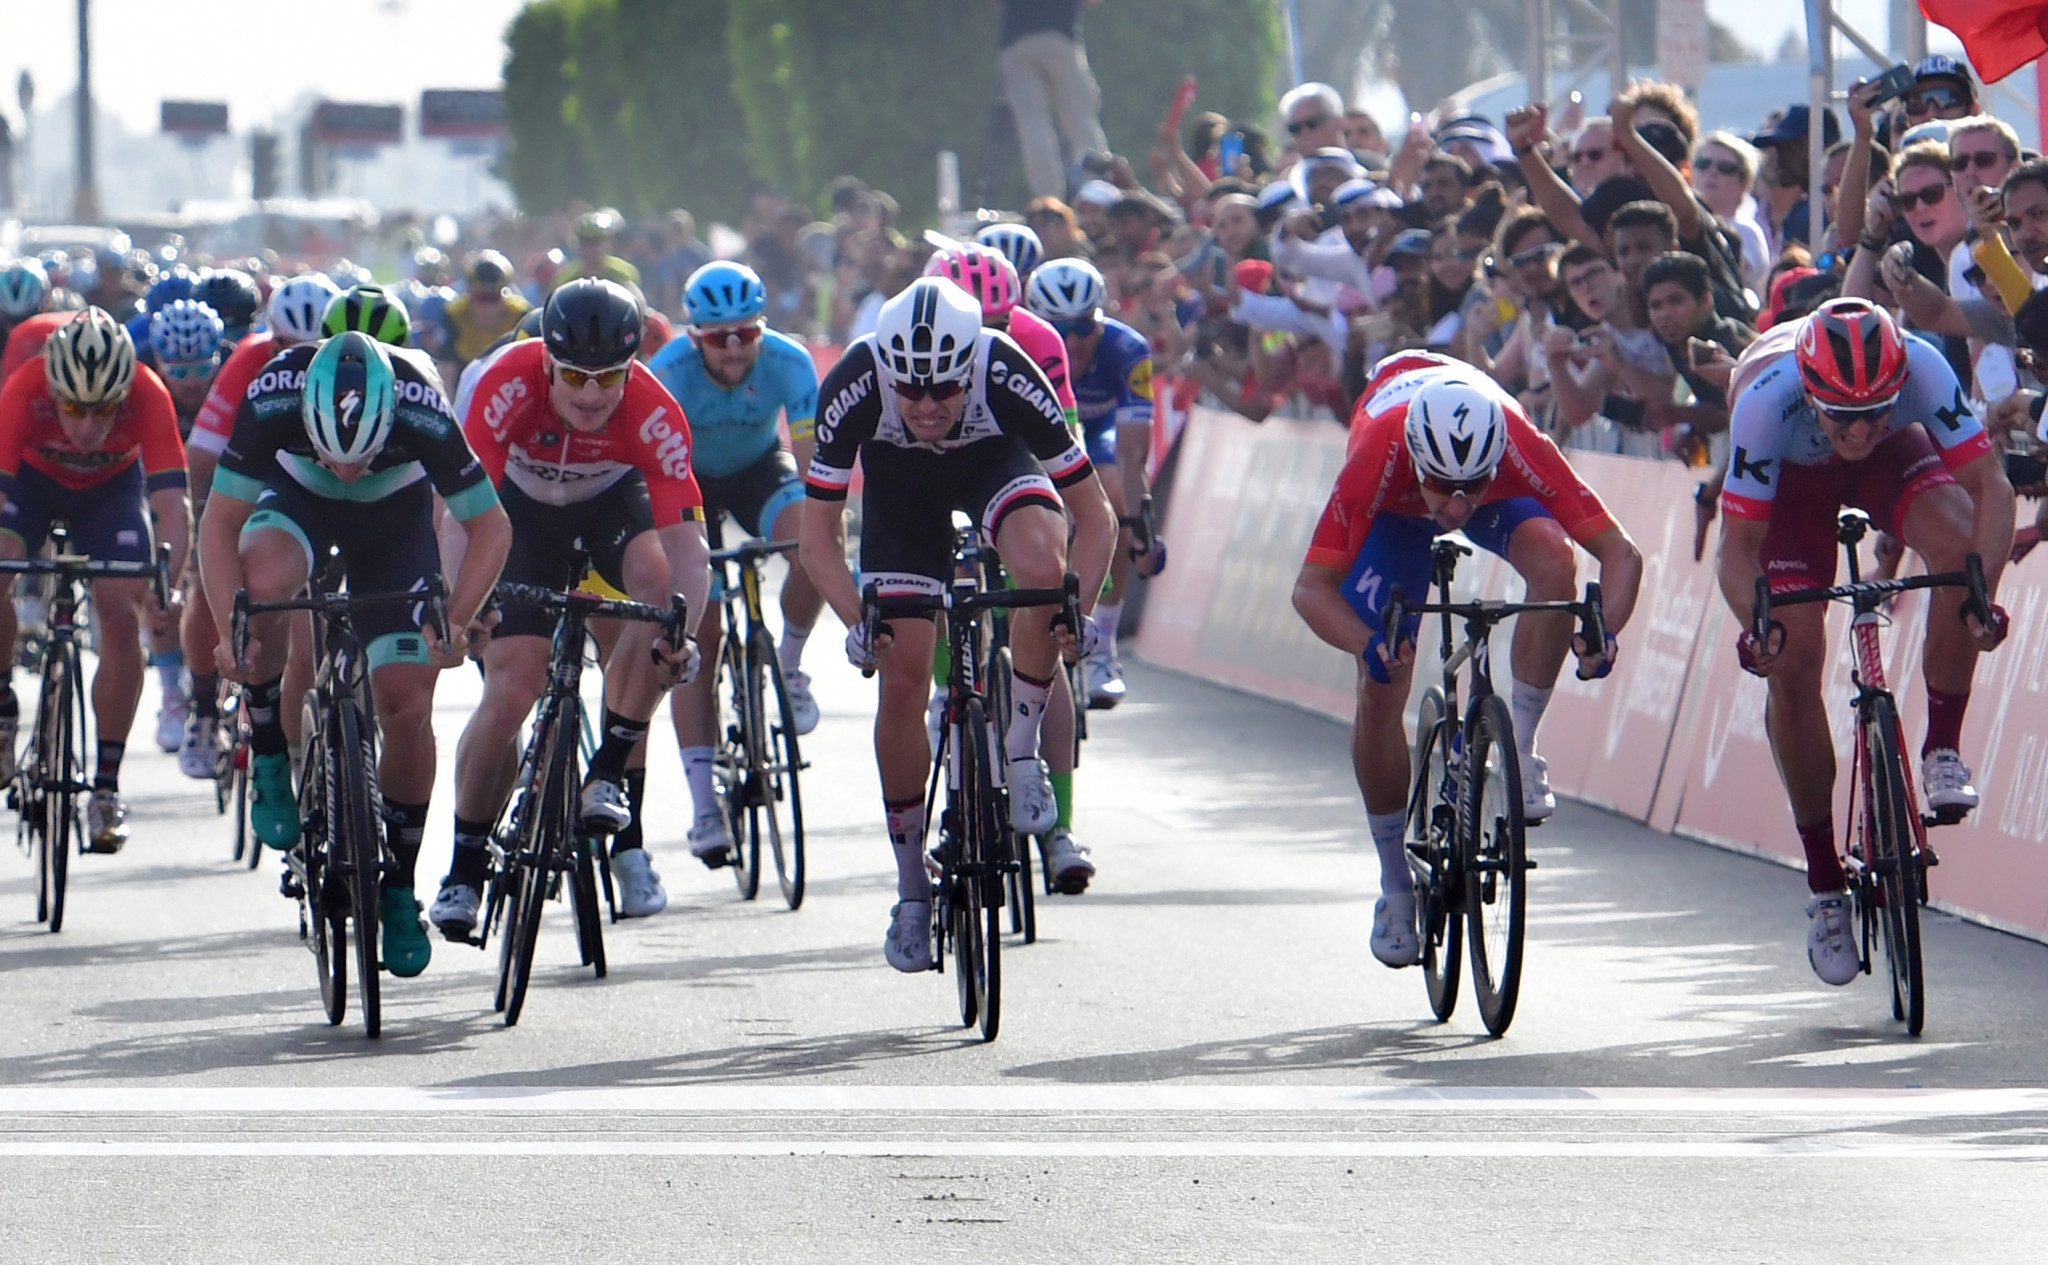 Bauhaus holds off late Kittel surge to win third stage of Abu Dhabi Tour